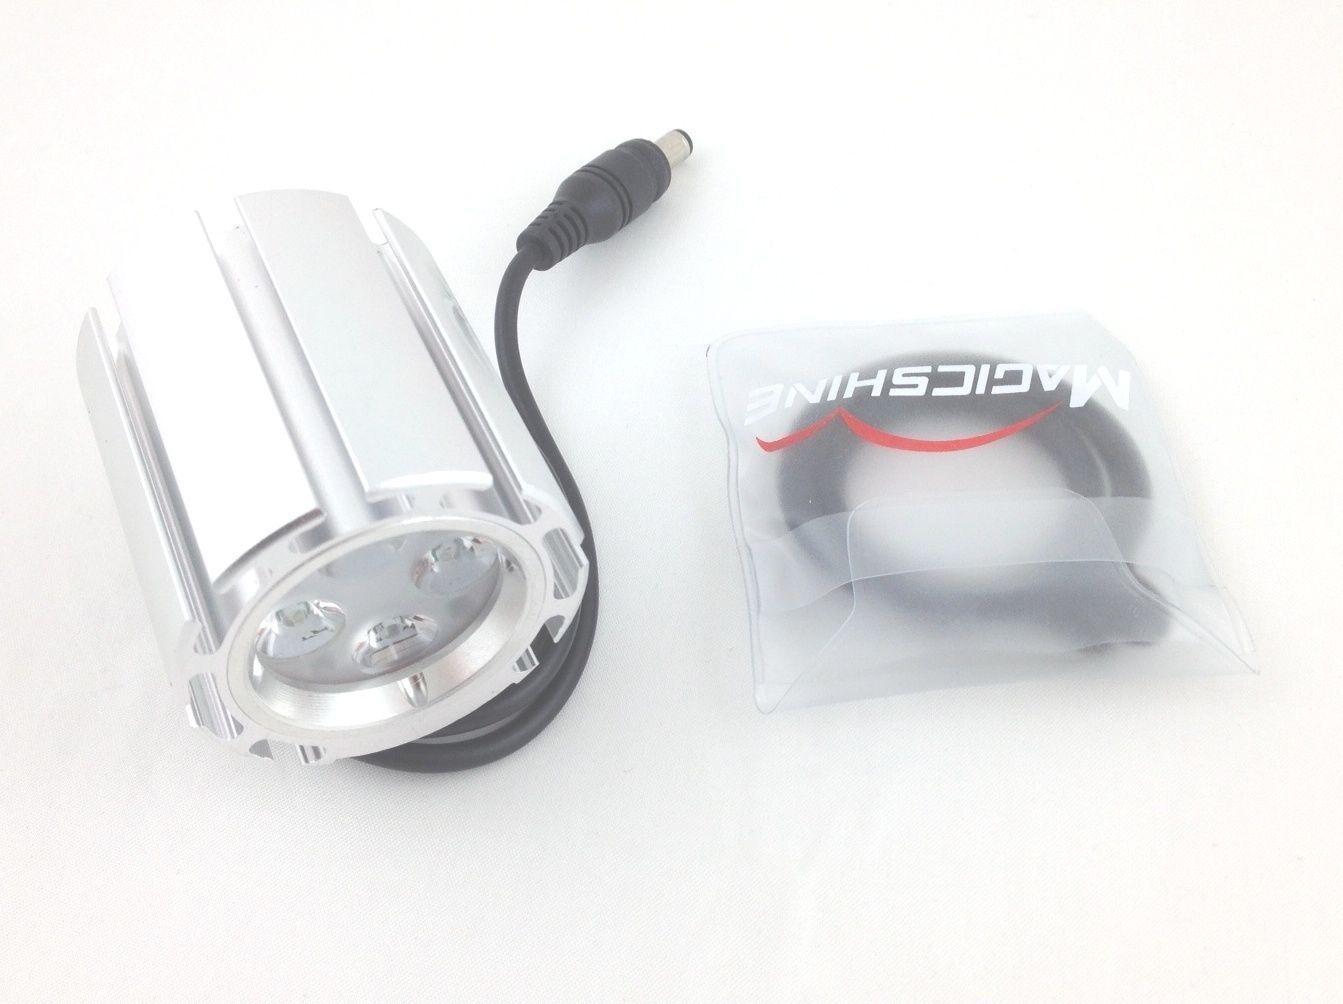 nuovo  MagicShine MJ856 4 mode 1600 Luuomini LED bicicletta Light Head ONLY  Orings